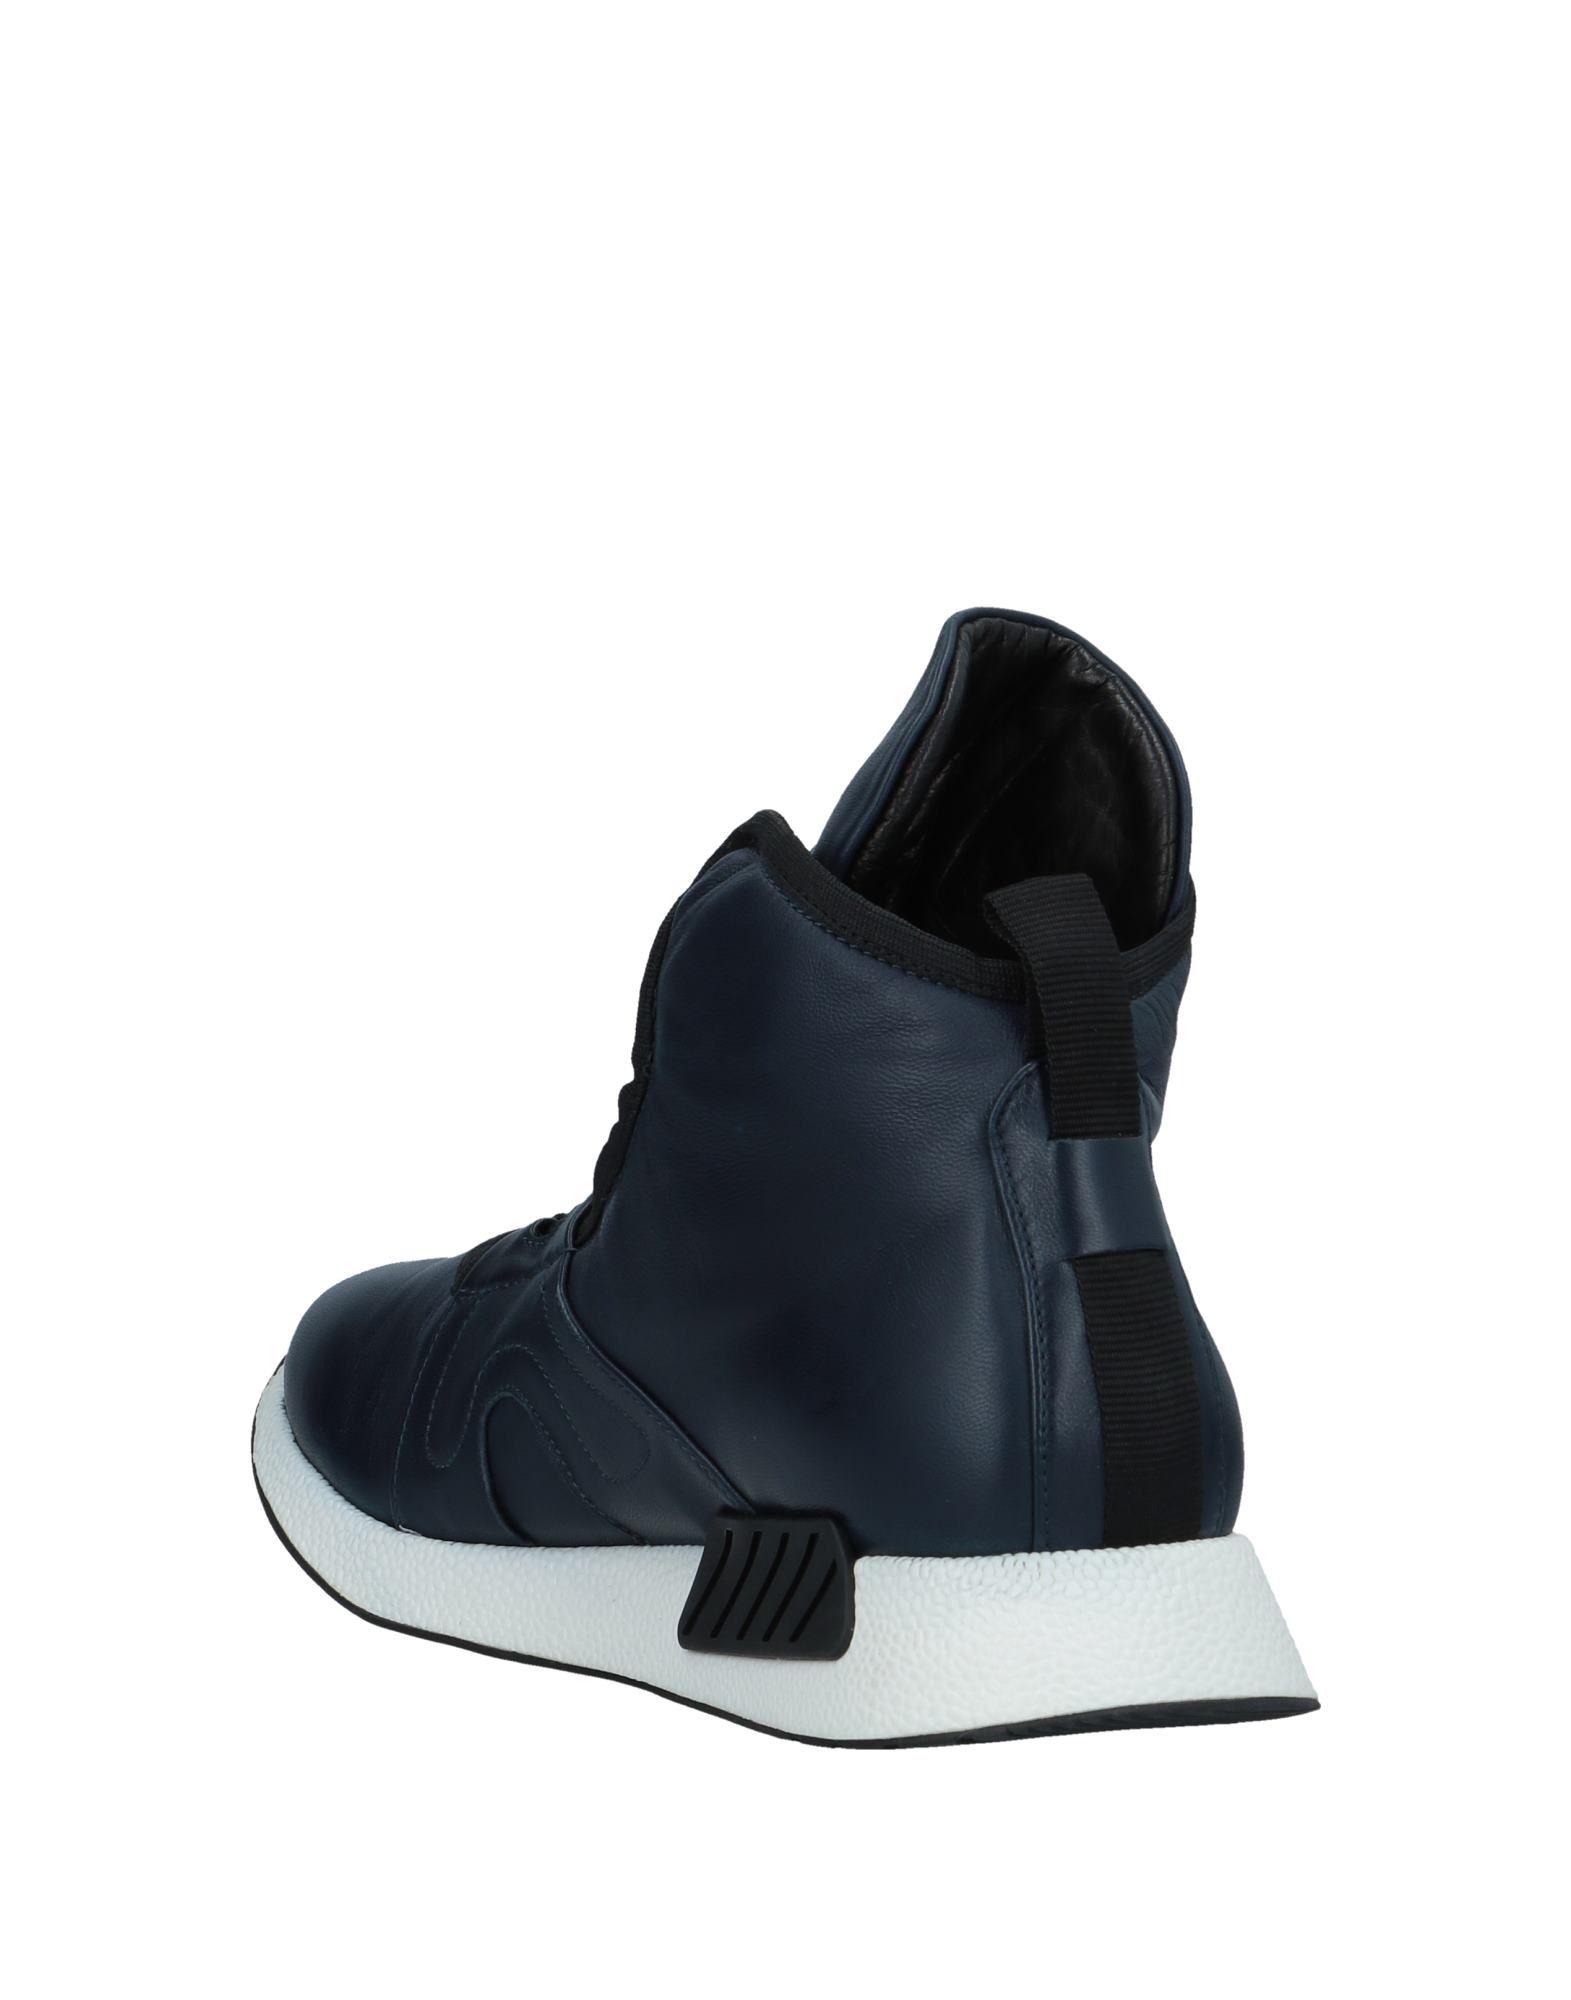 Stilvolle billige Schuhe Damen Logan Crossing Sneakers Damen Schuhe  11532198PB 736ce3